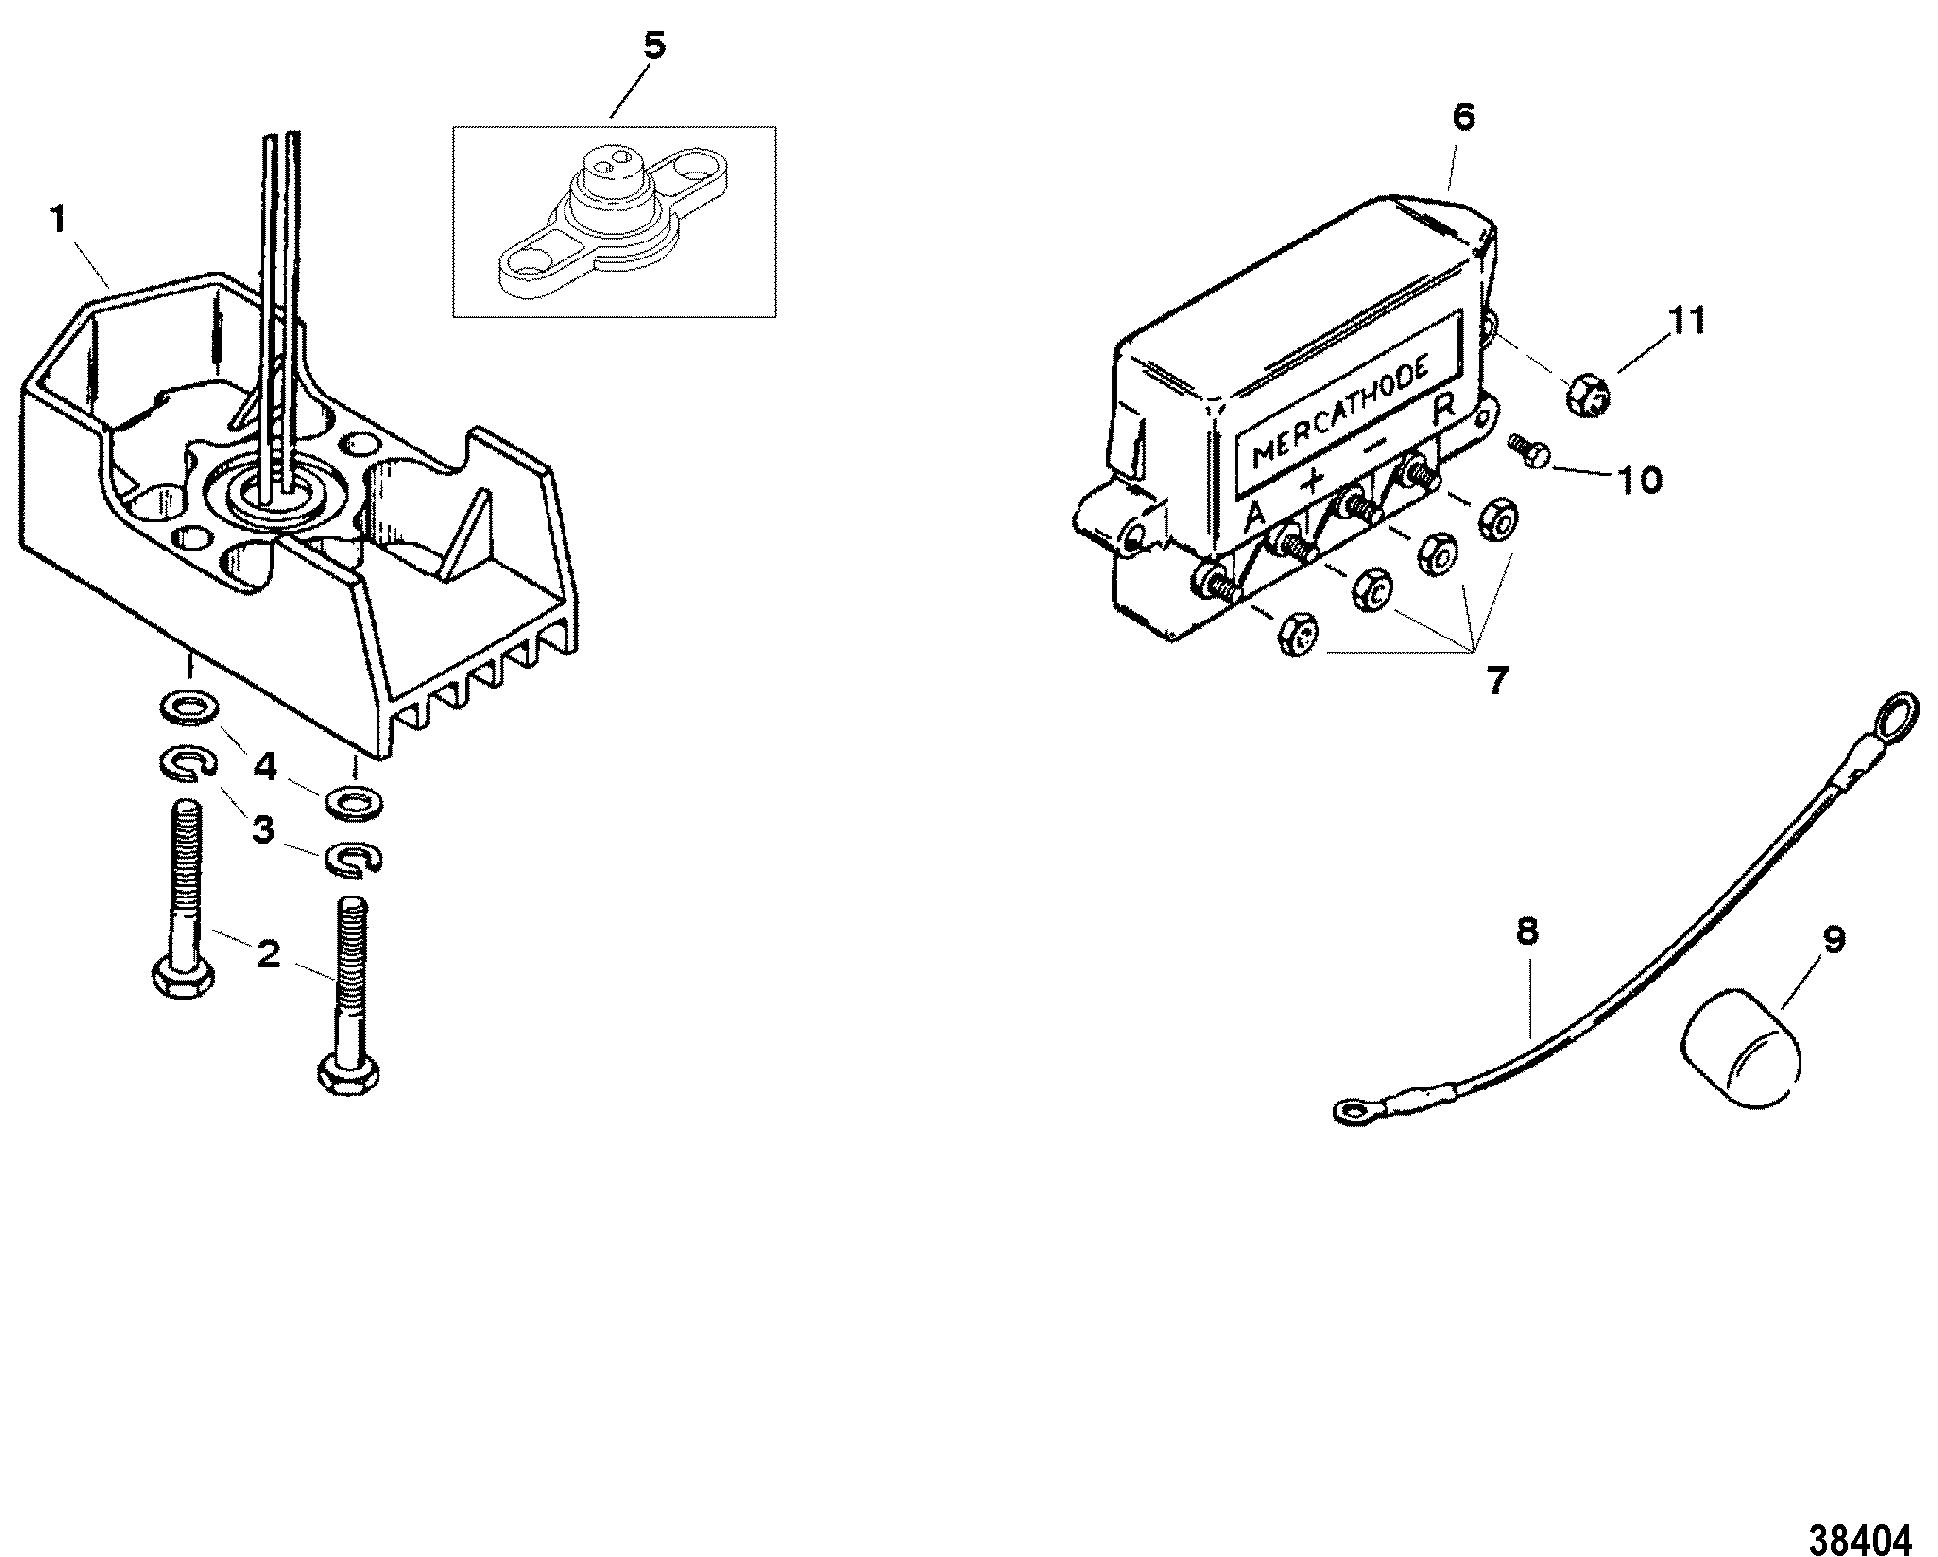 Wondrous Coil Wiring Diagram 1974 Mercruiser 888 302 Wiring Diagrams Wiring 101 Capemaxxcnl